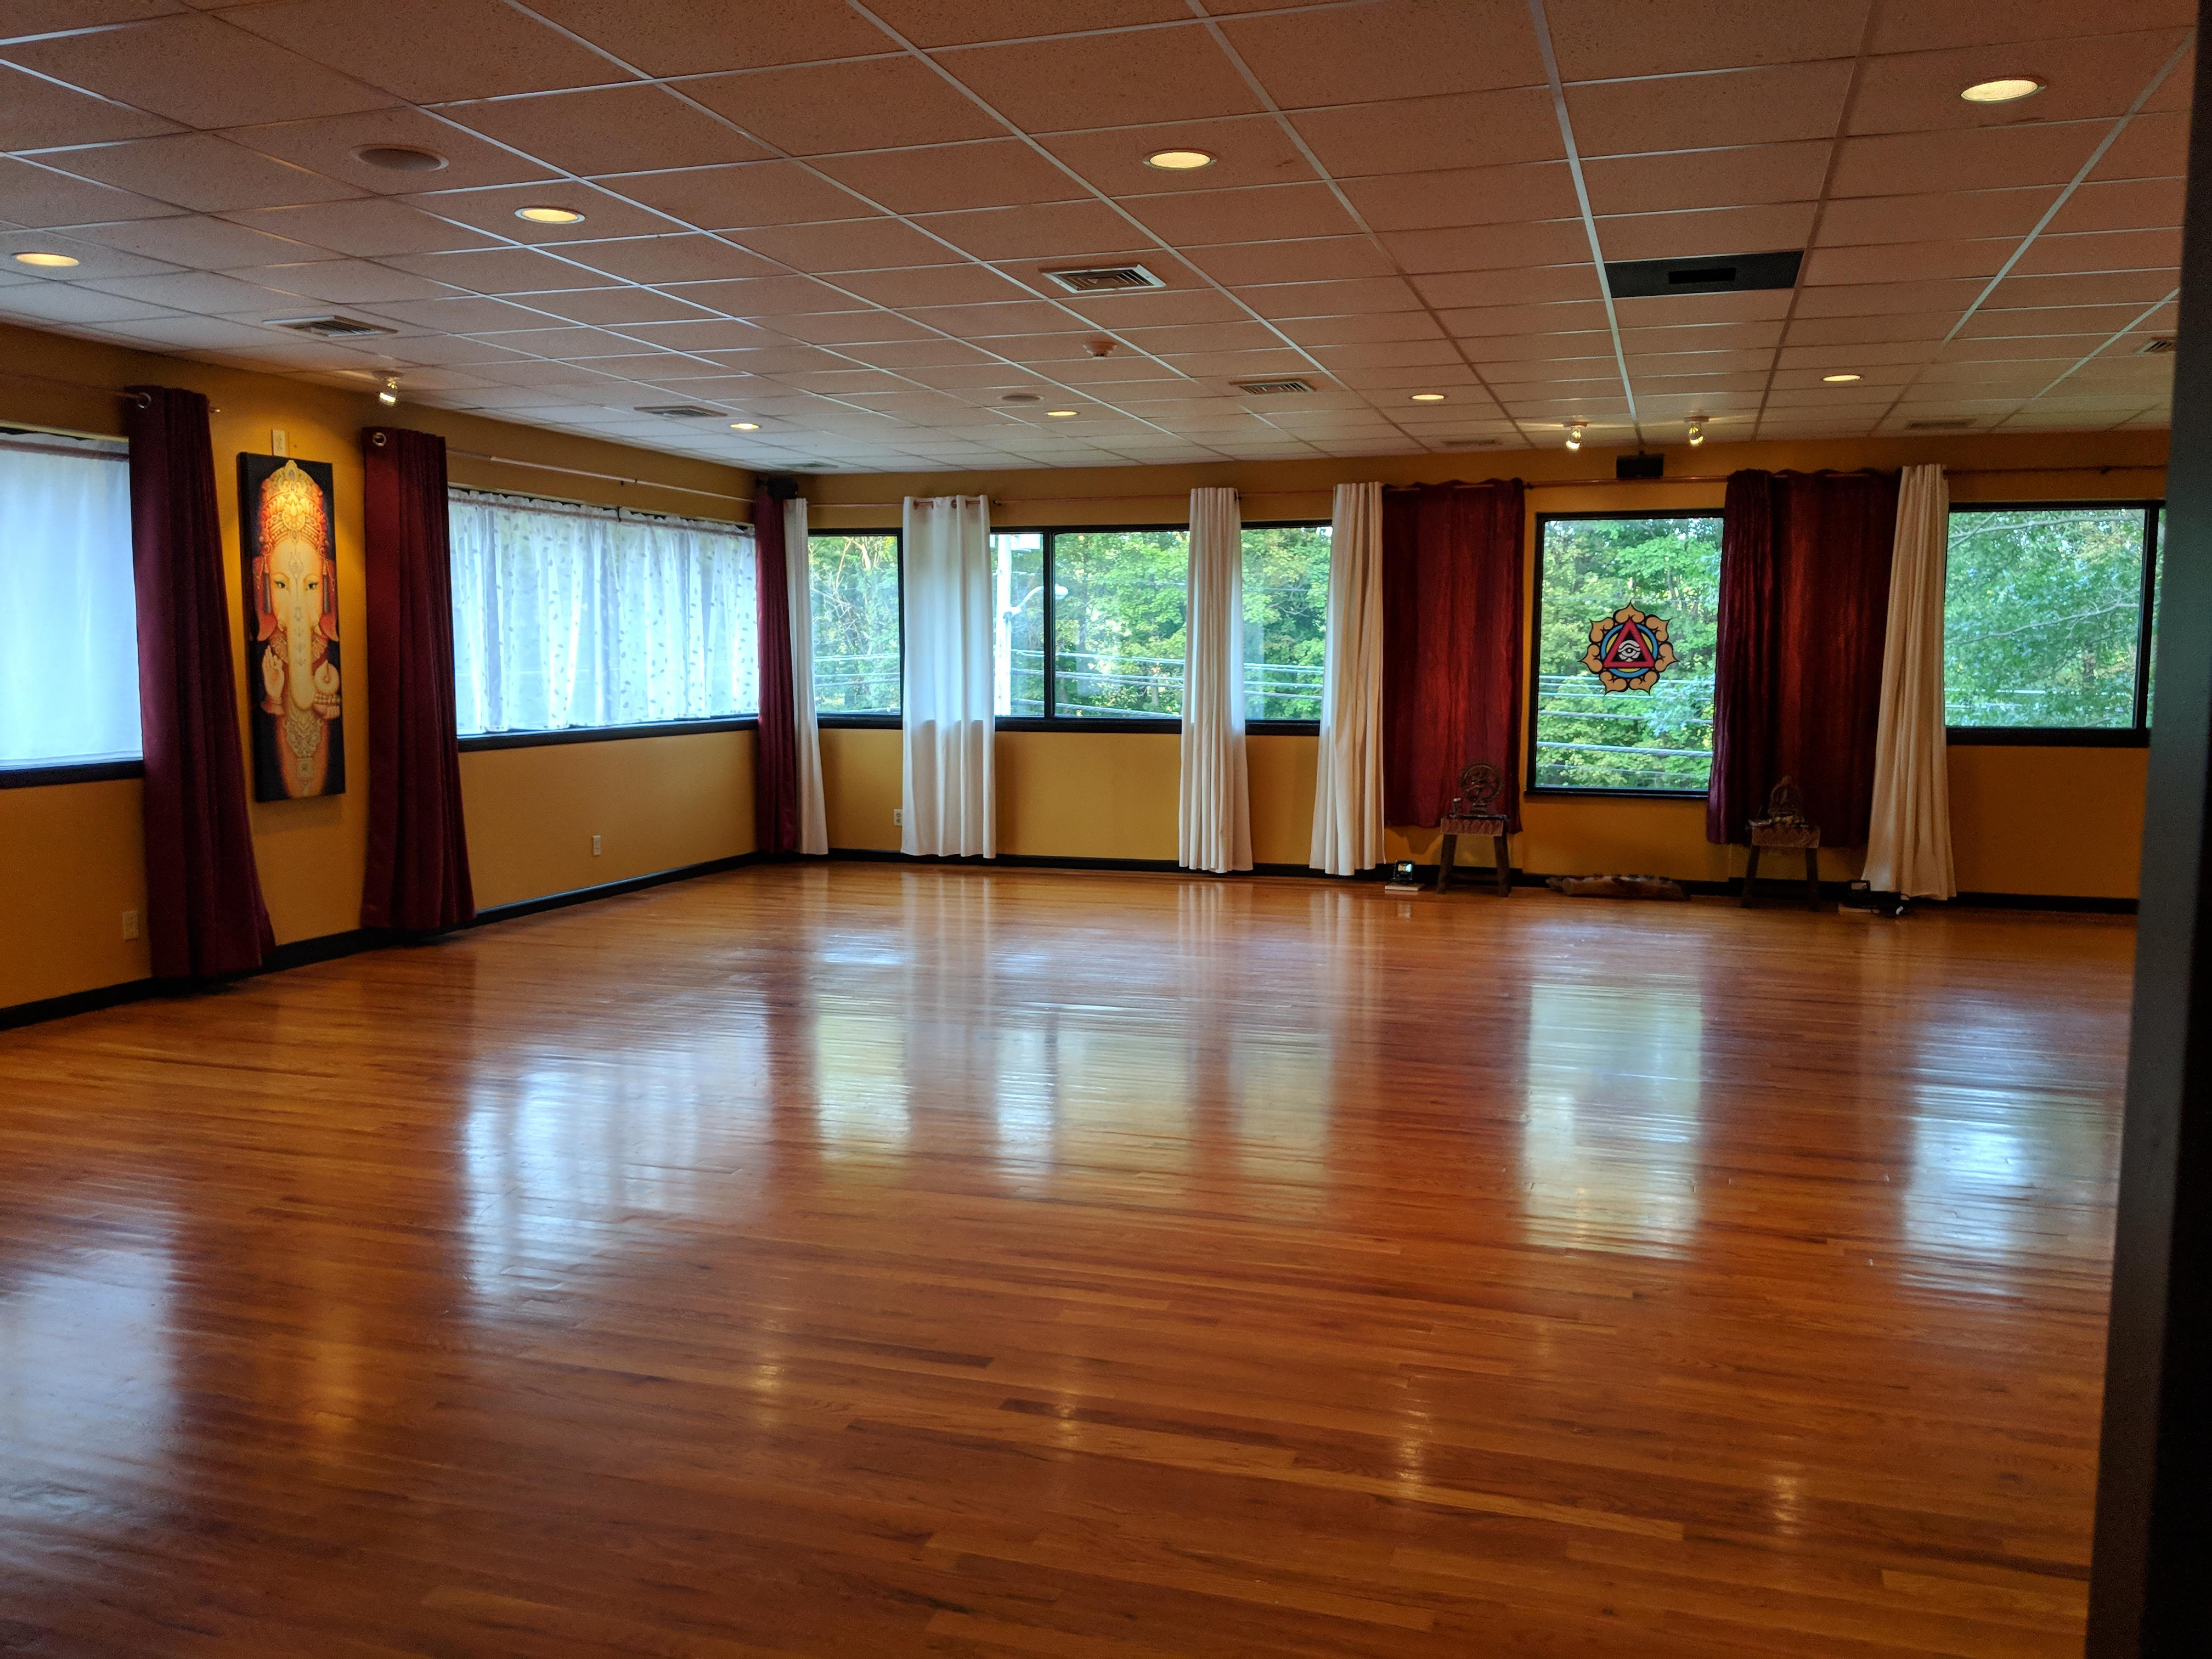 Liberation Yoga & Wellness Center image 5